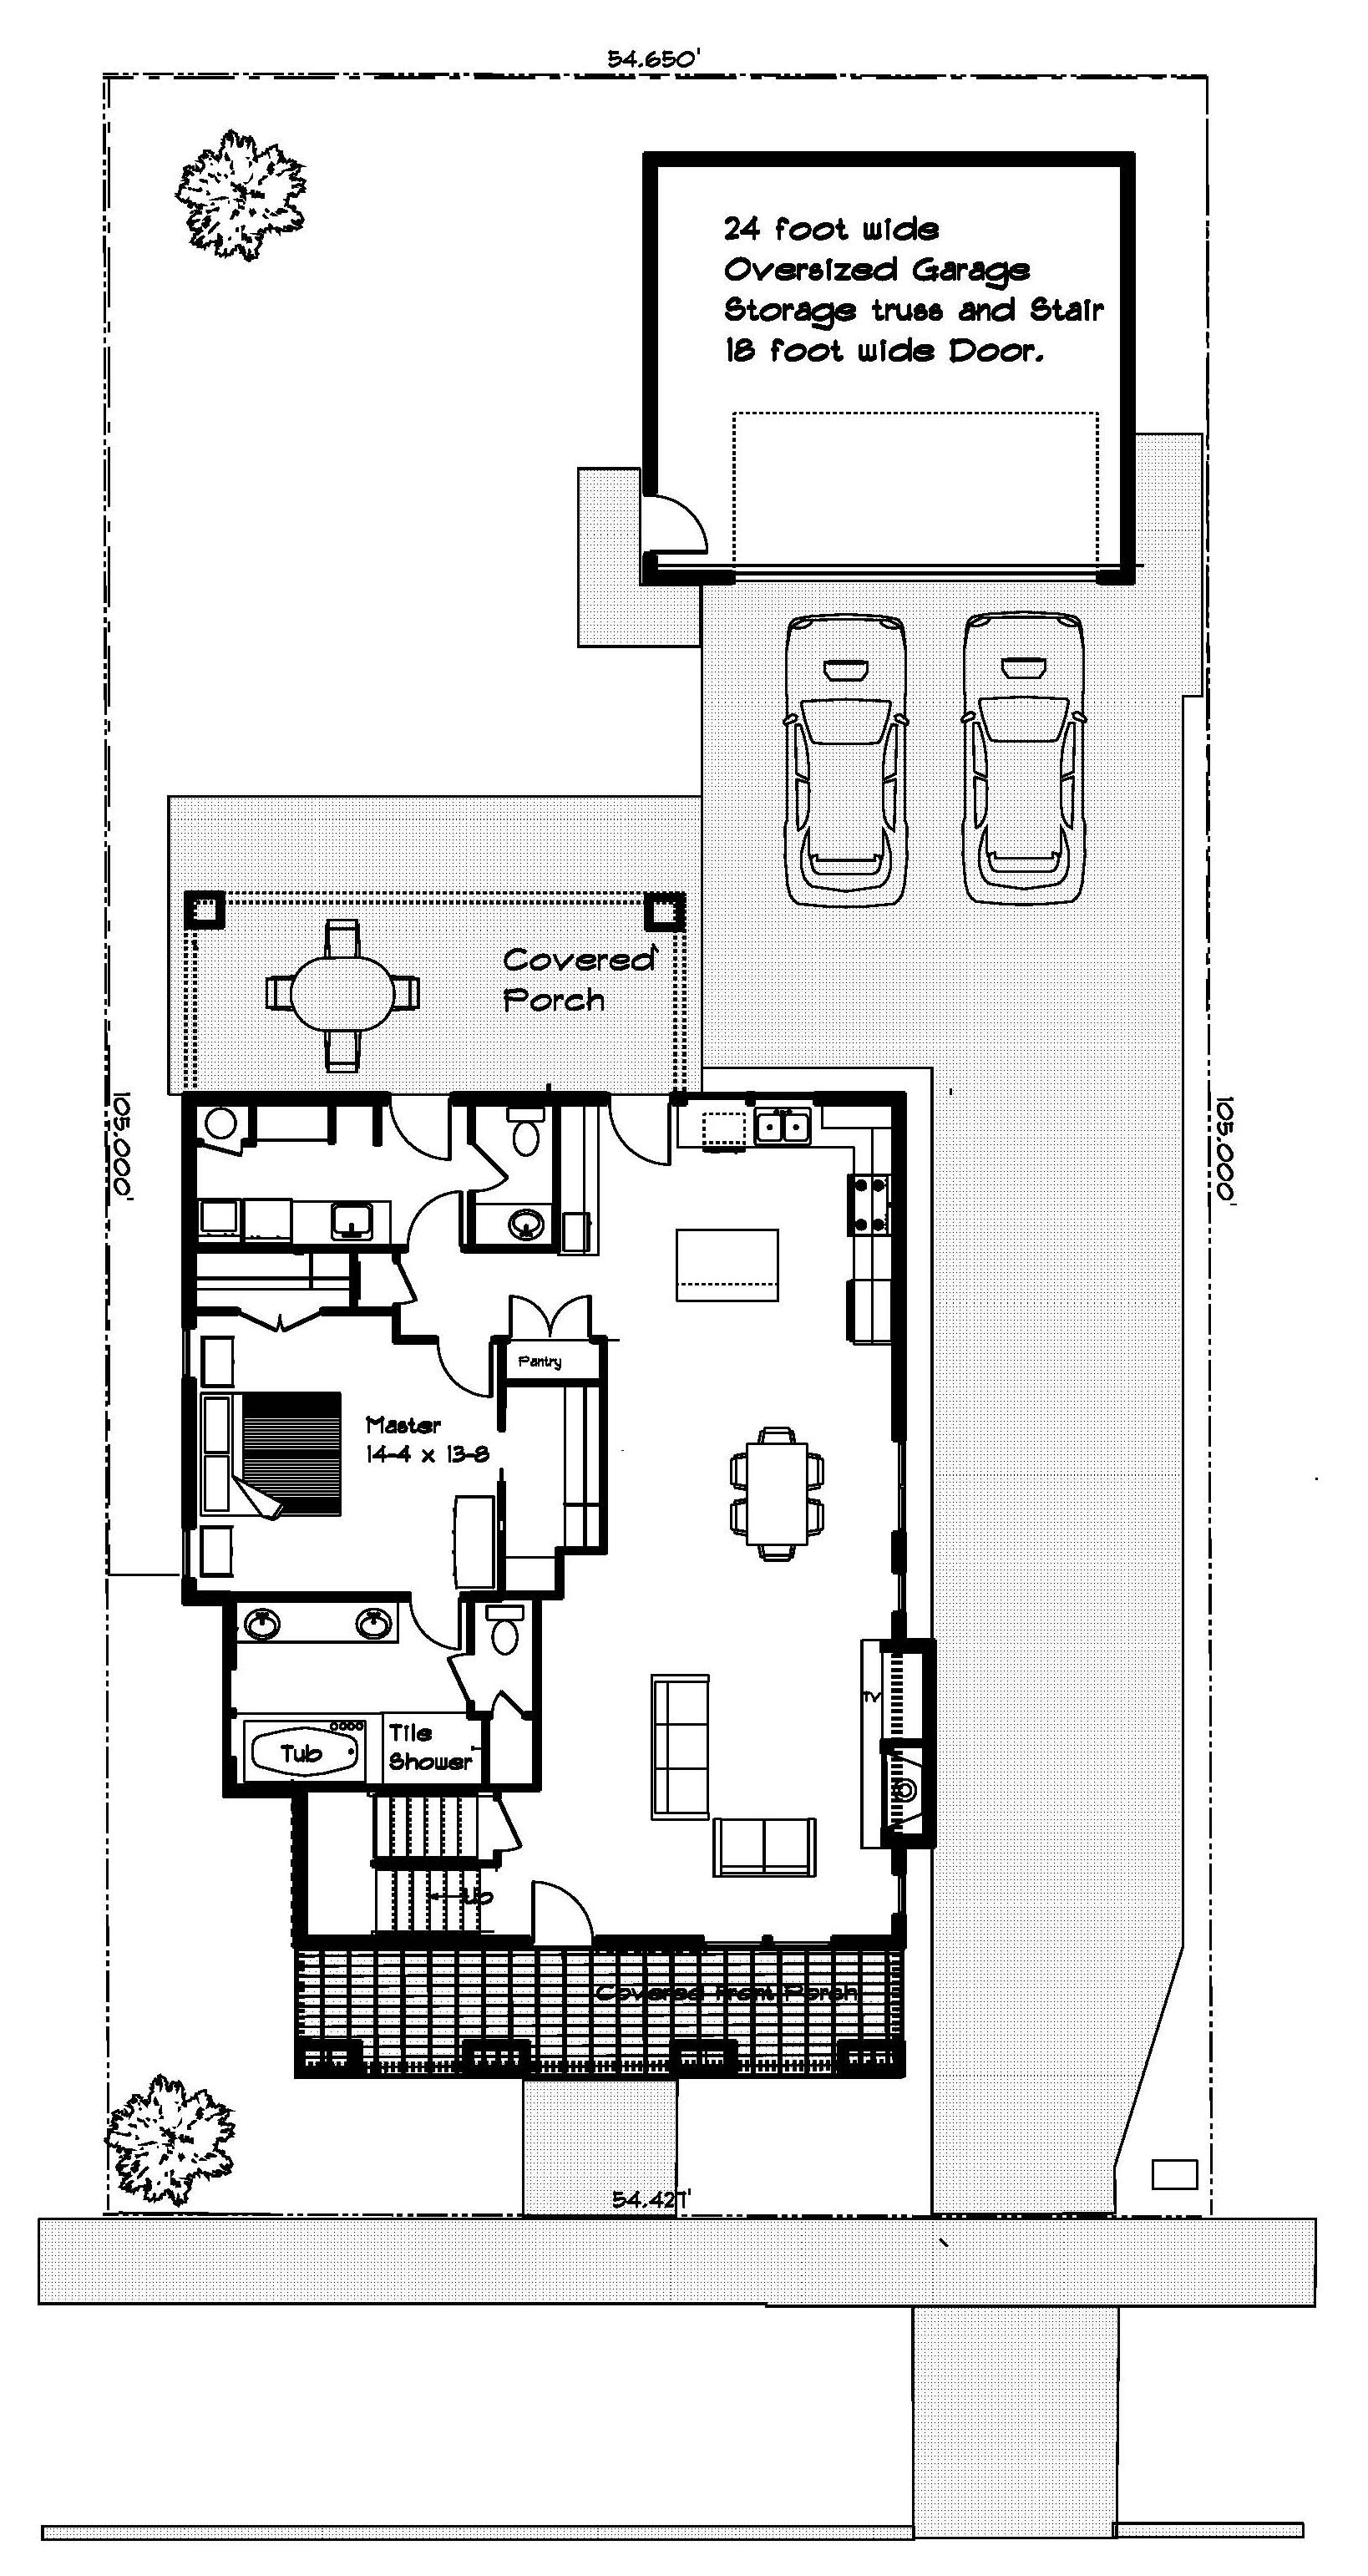 Lot 7 BrooksMill main floor 4.15.2017